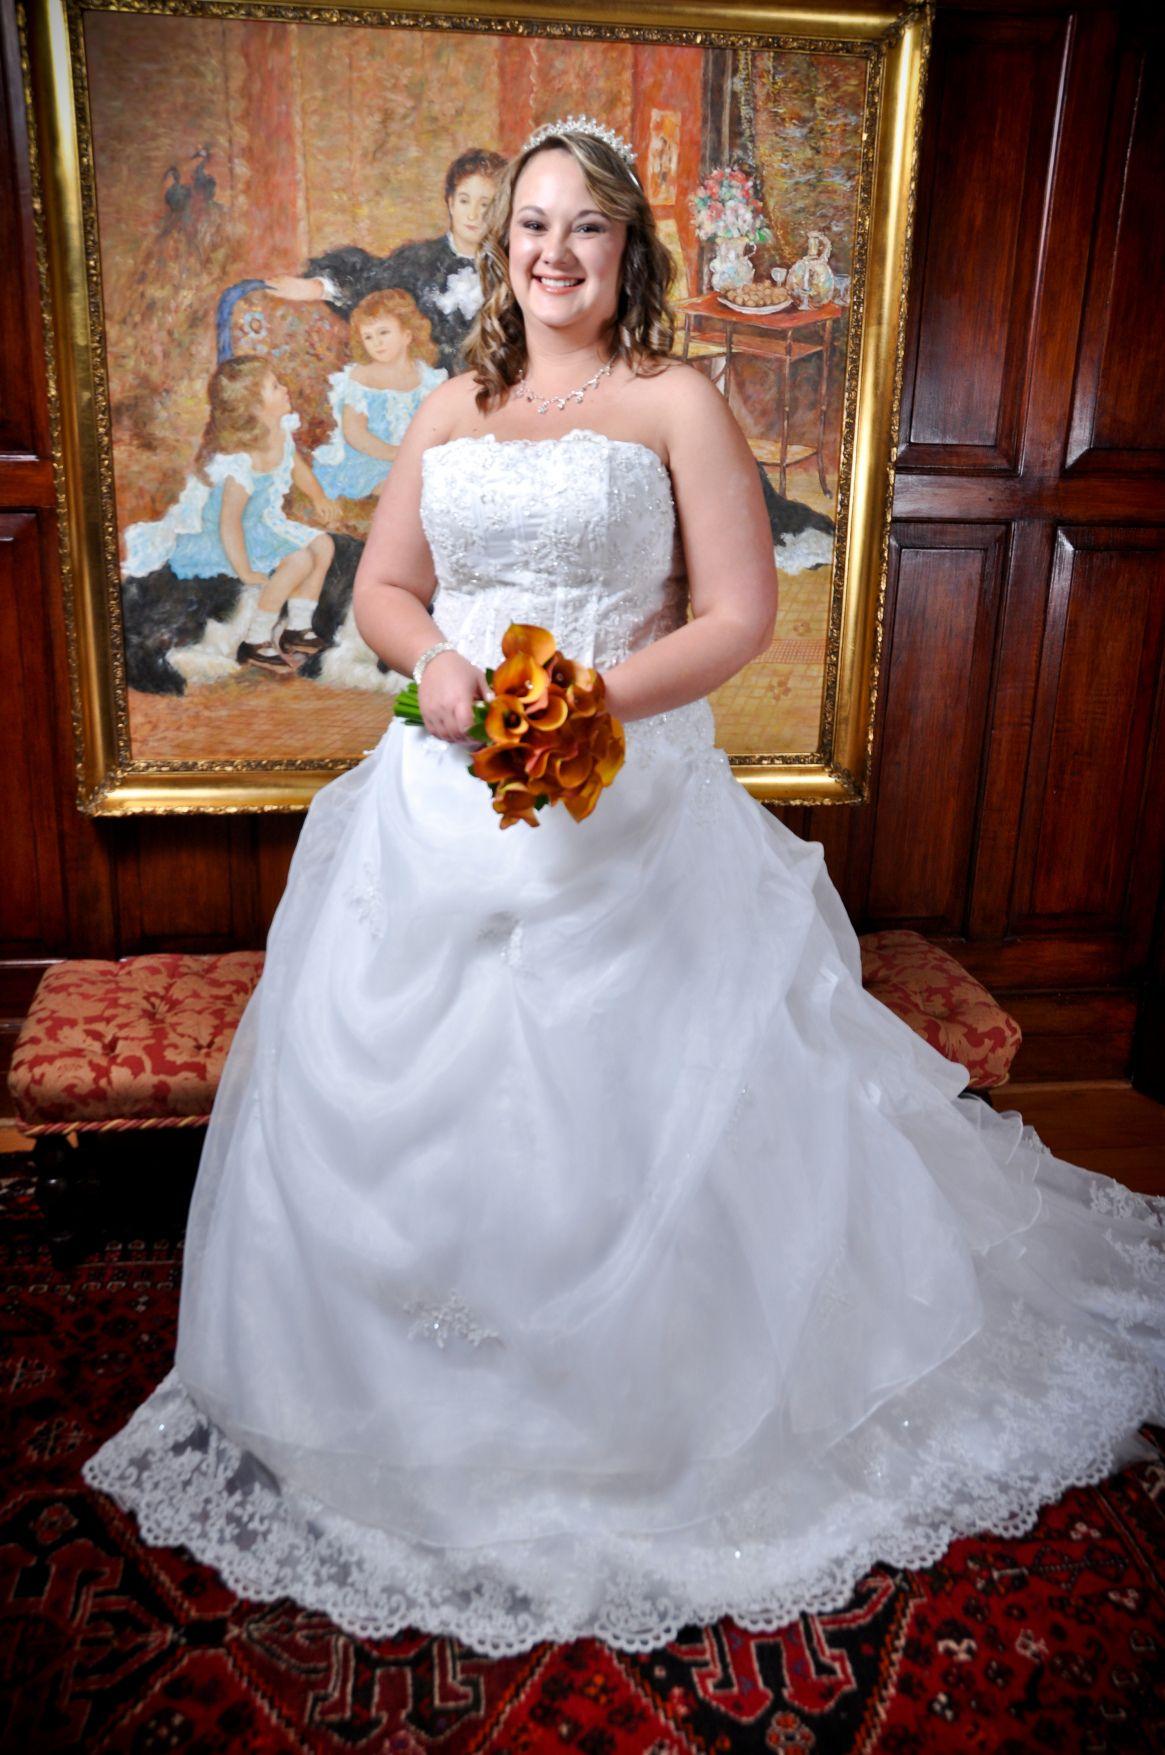 99+ where Can I Sell My Wedding Dress Locally - Best Wedding Dress ...